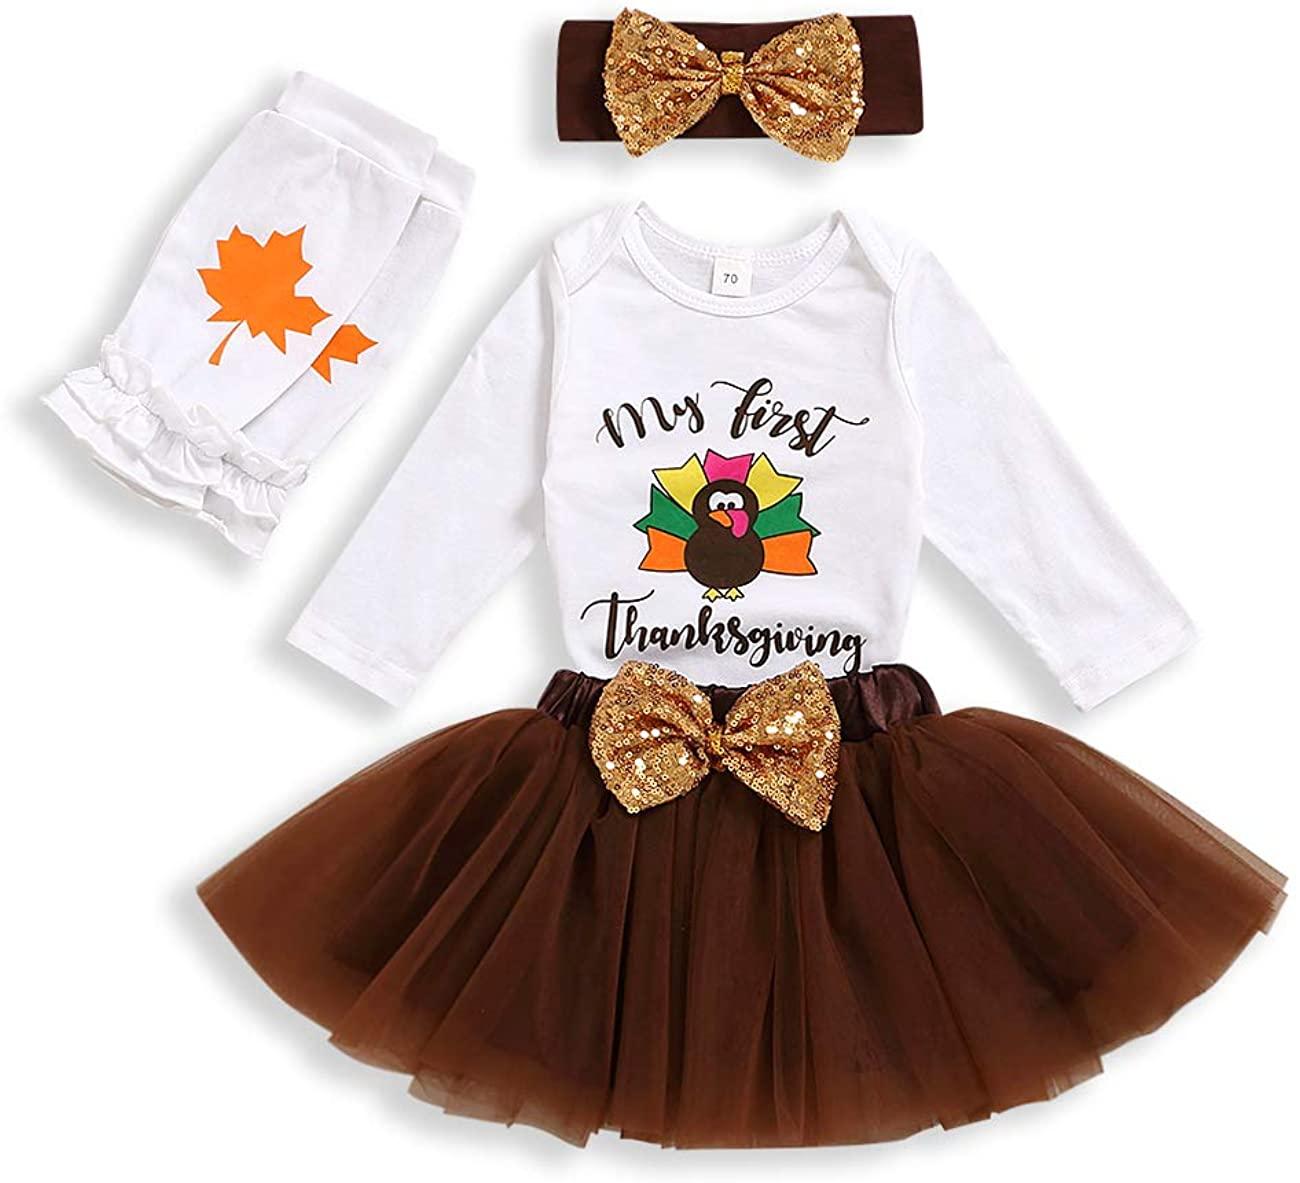 My First Thanksgiving Outfit Newborn Baby Girls Rompers+Skirt+Socks +Headband Set